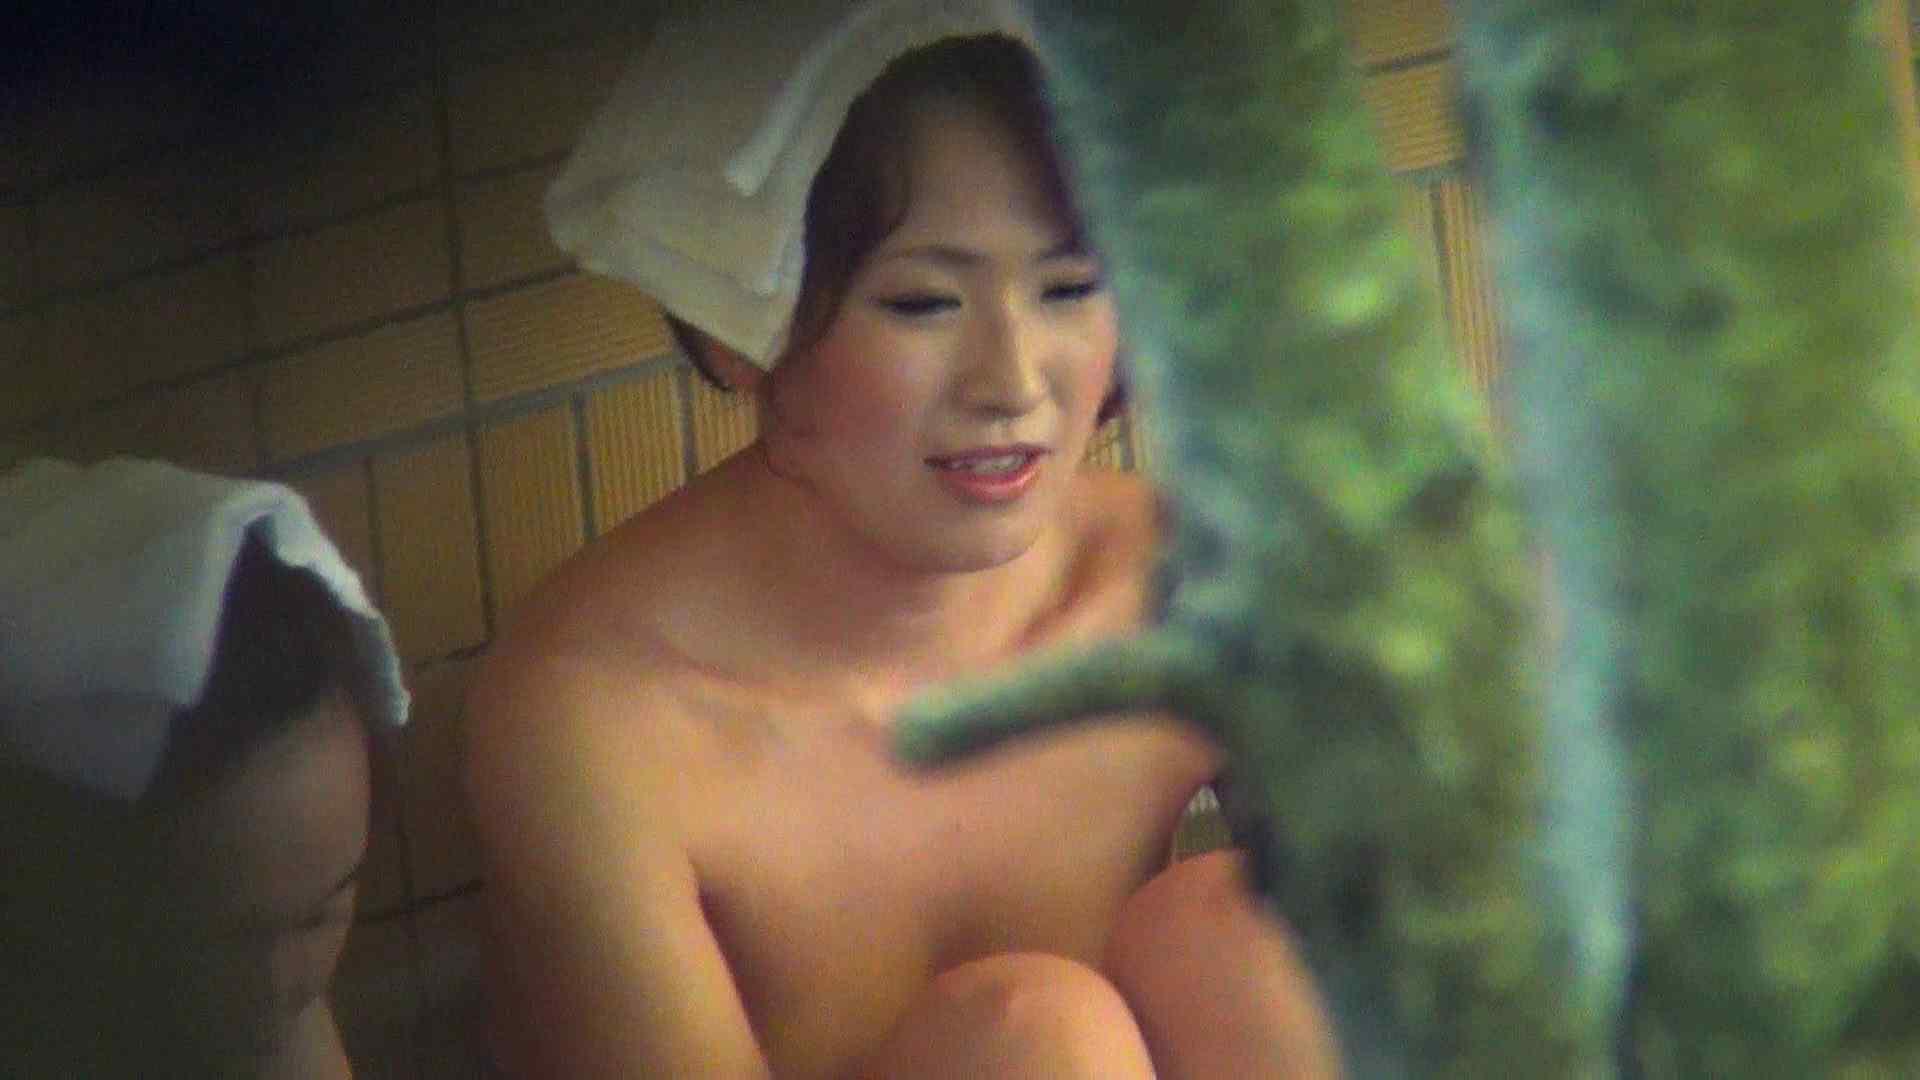 Vol.42 顔と肉体の年齢的ギャップ 色っぽいOL達 セックス画像 54pic 5